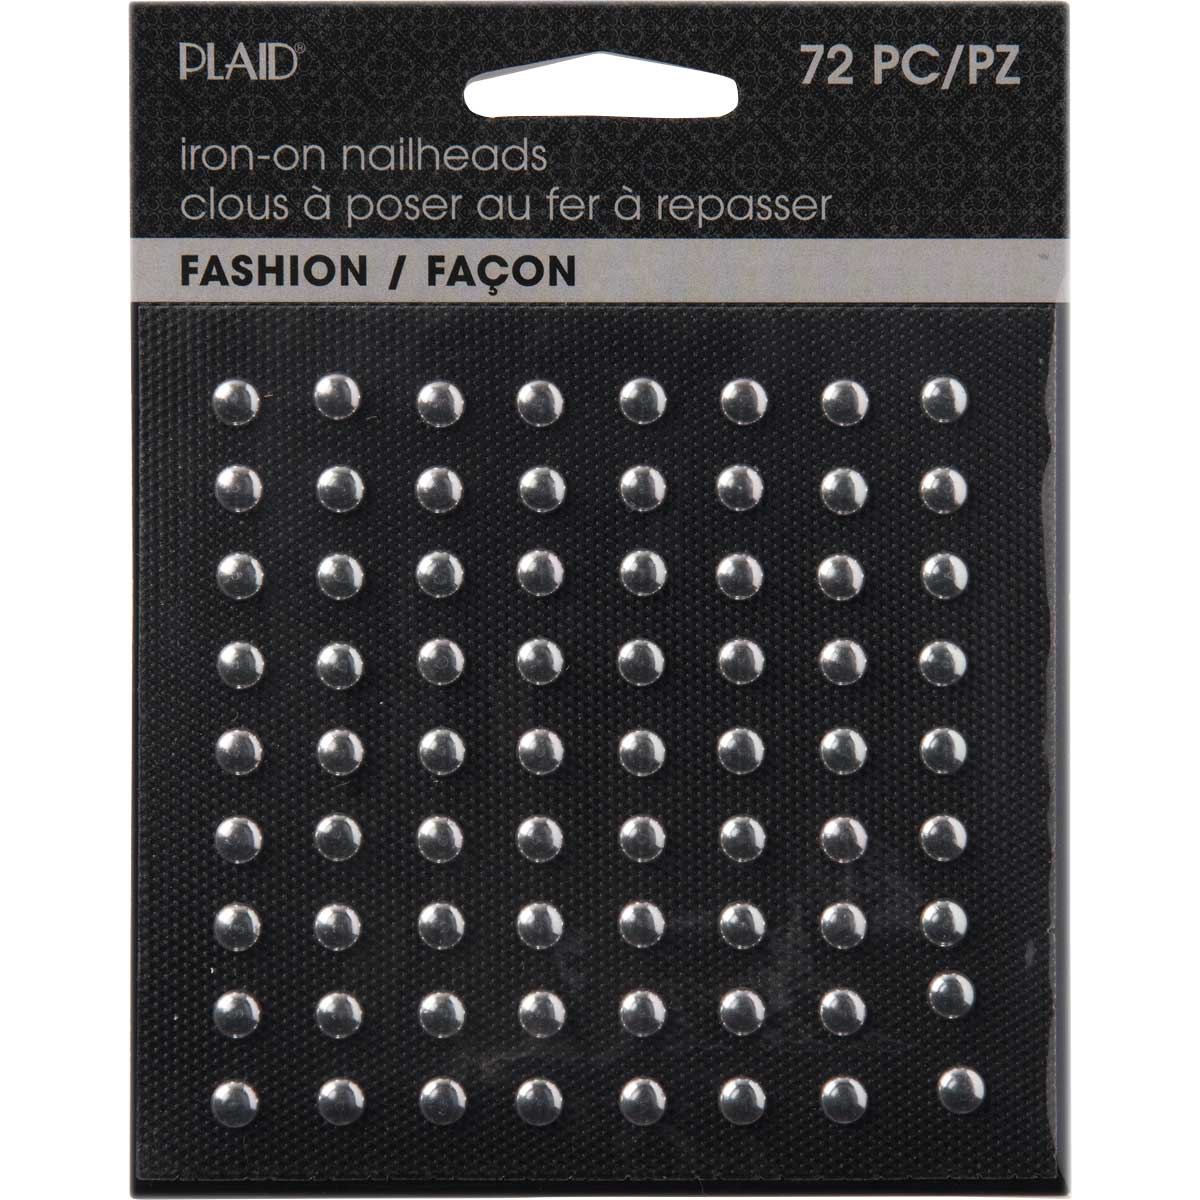 Plaid ® Hot Fix Nailhead Iron-Ons - Round Shiny Silver